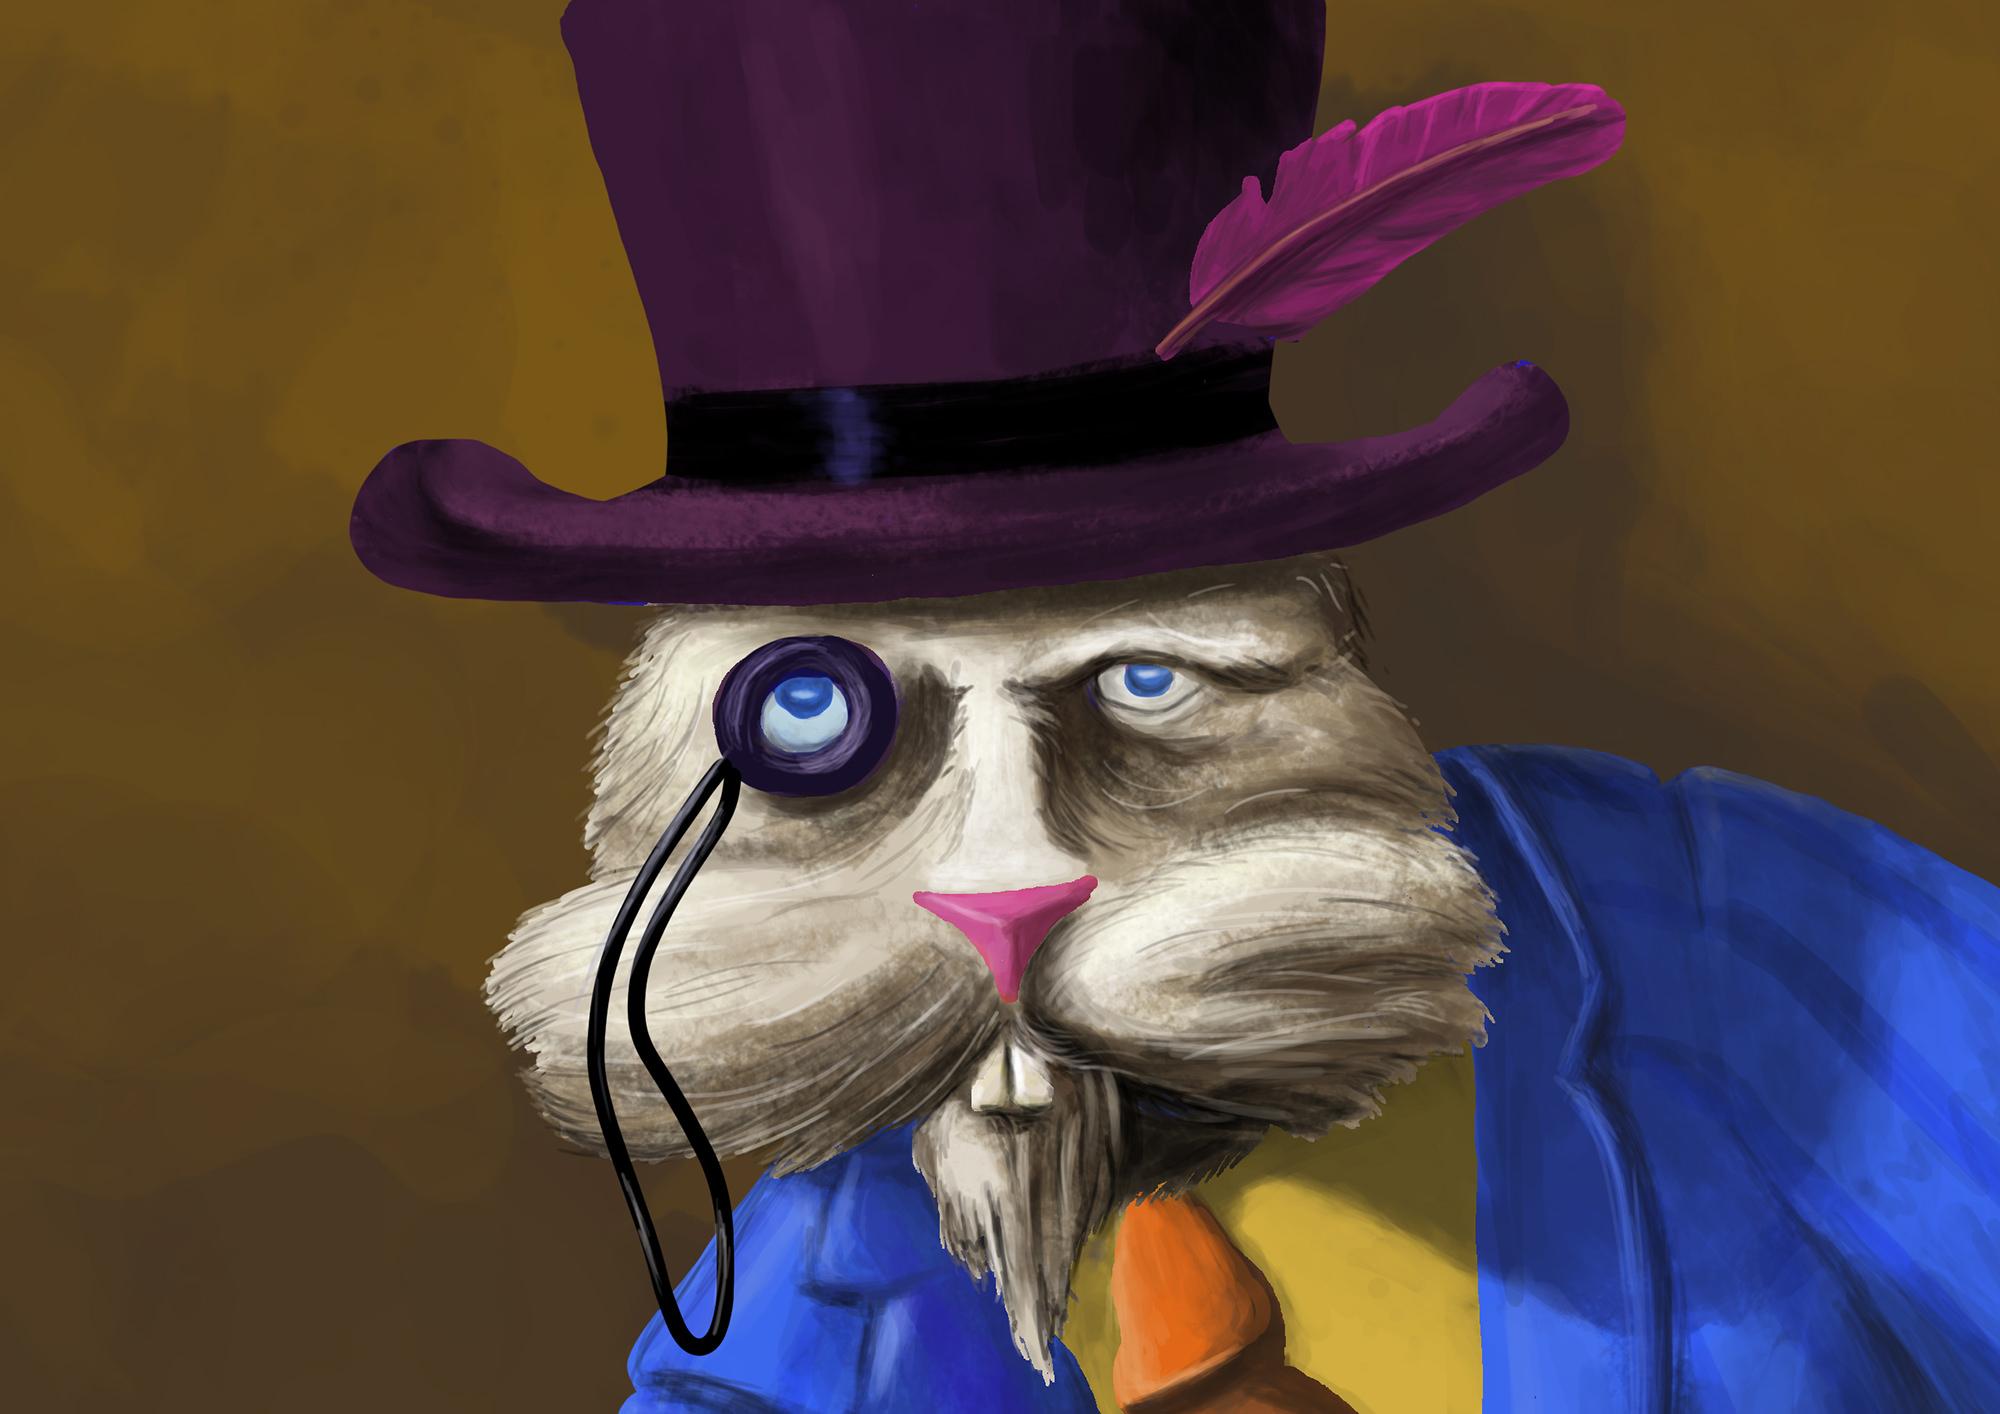 Ilustrație (desen digital) - The White Rabbit, years later (detaliu)